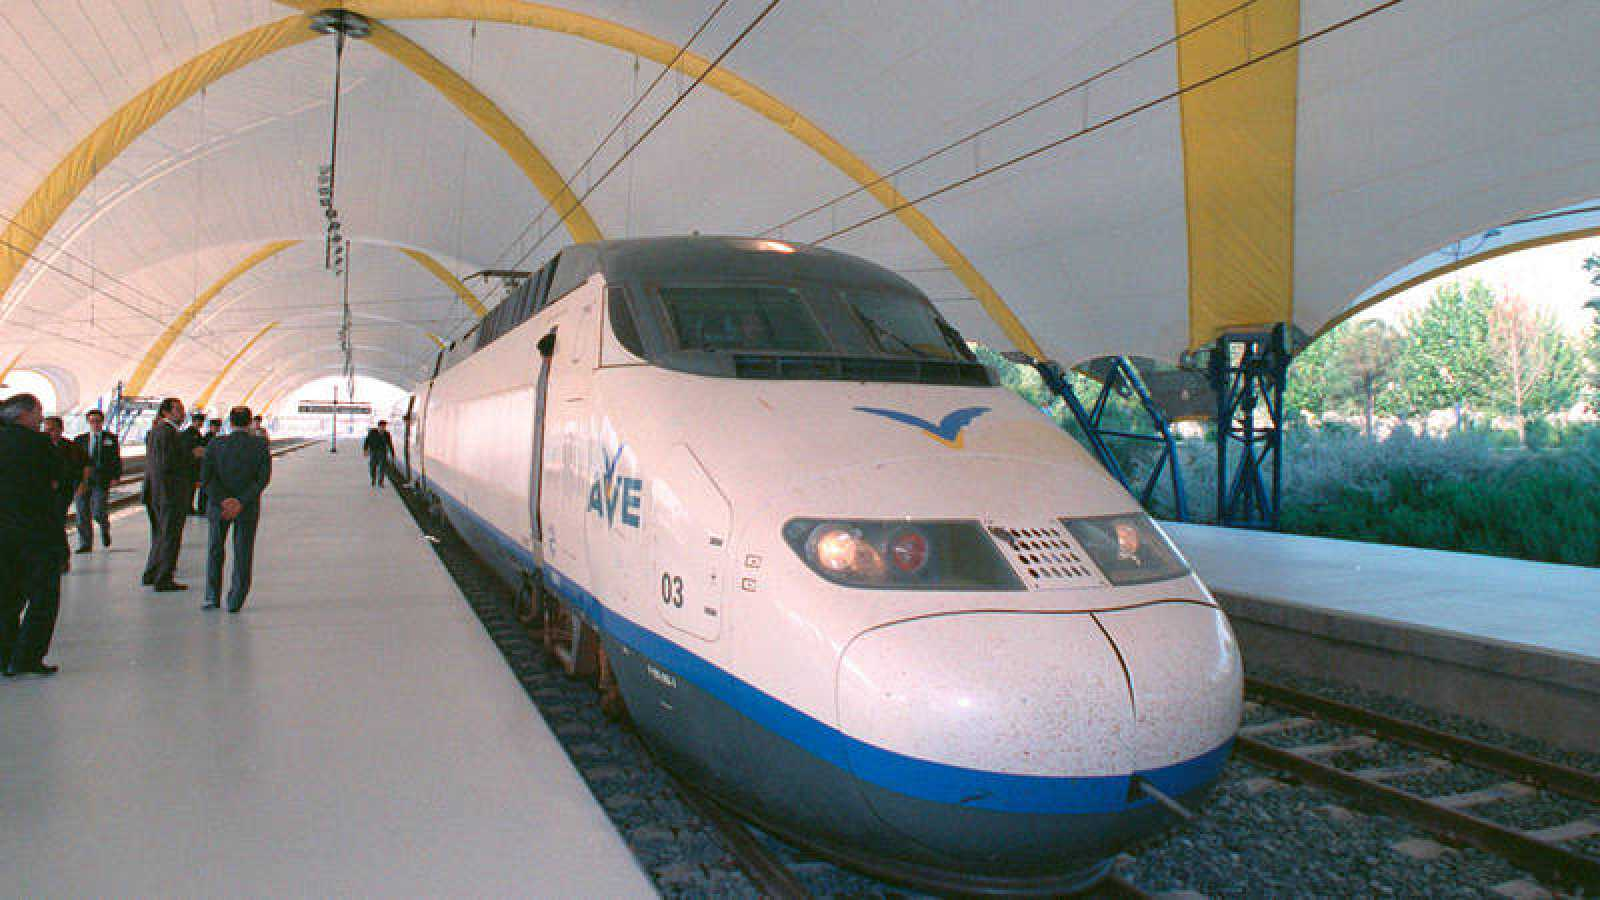 El viaje inaugural del AVE a Sevilla se realizó el 14 de abril de 1992